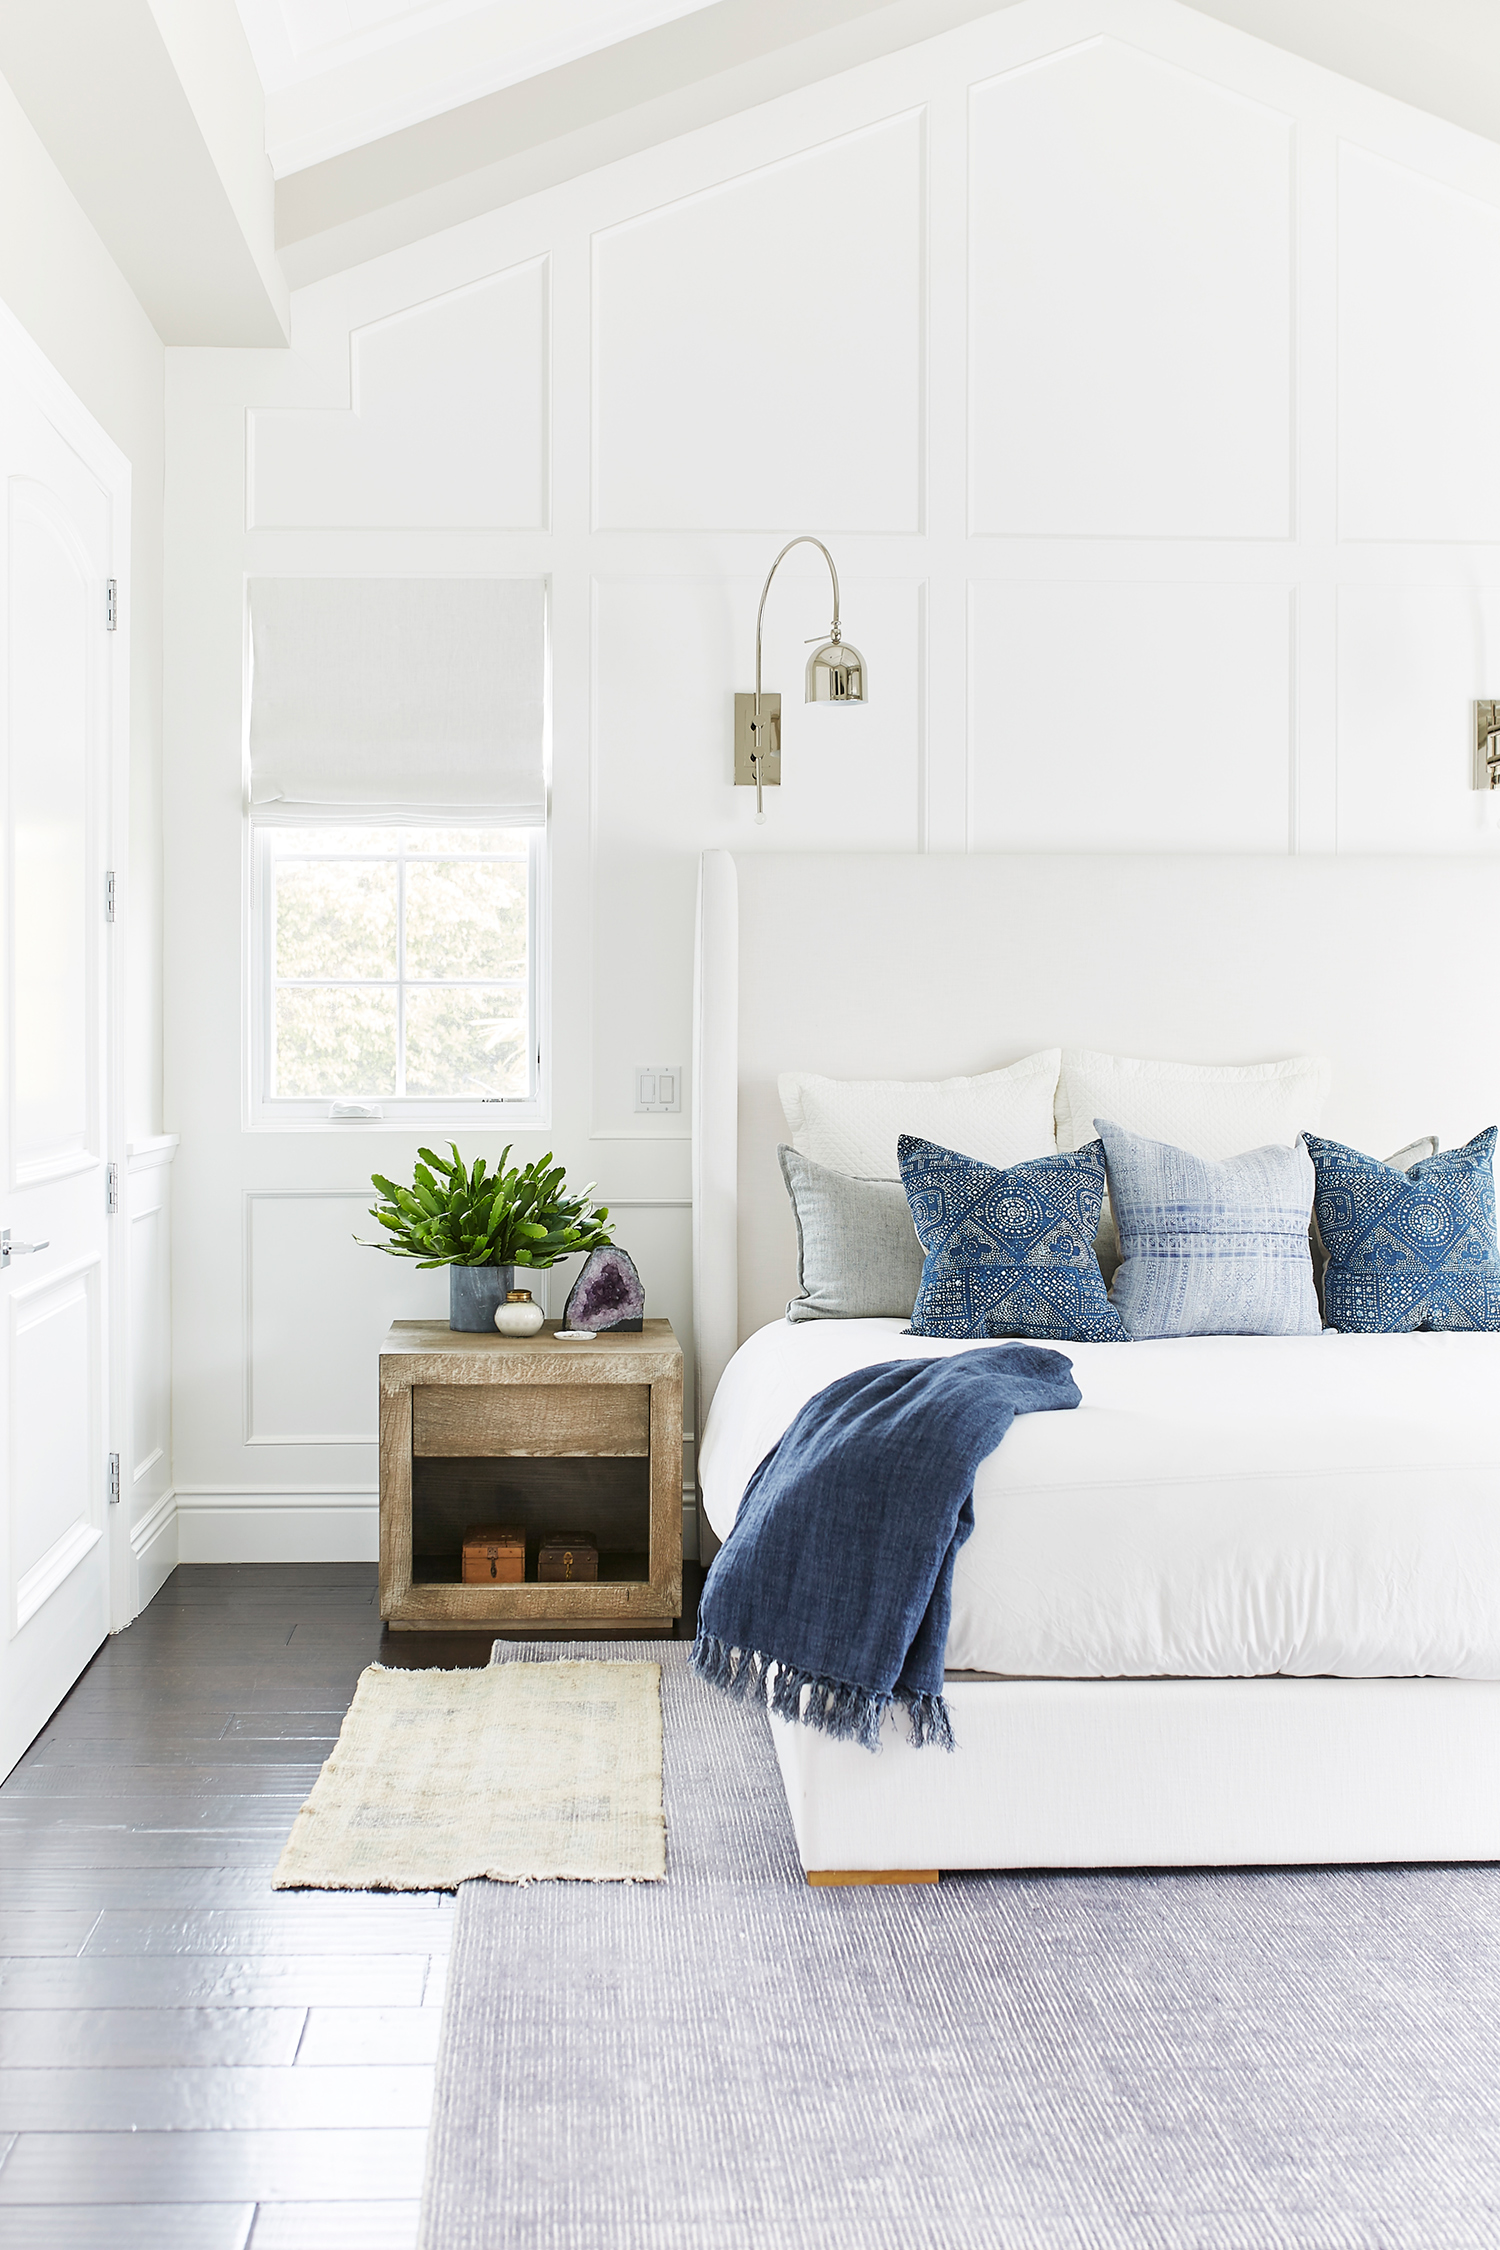 Interior Design by Pure Salt